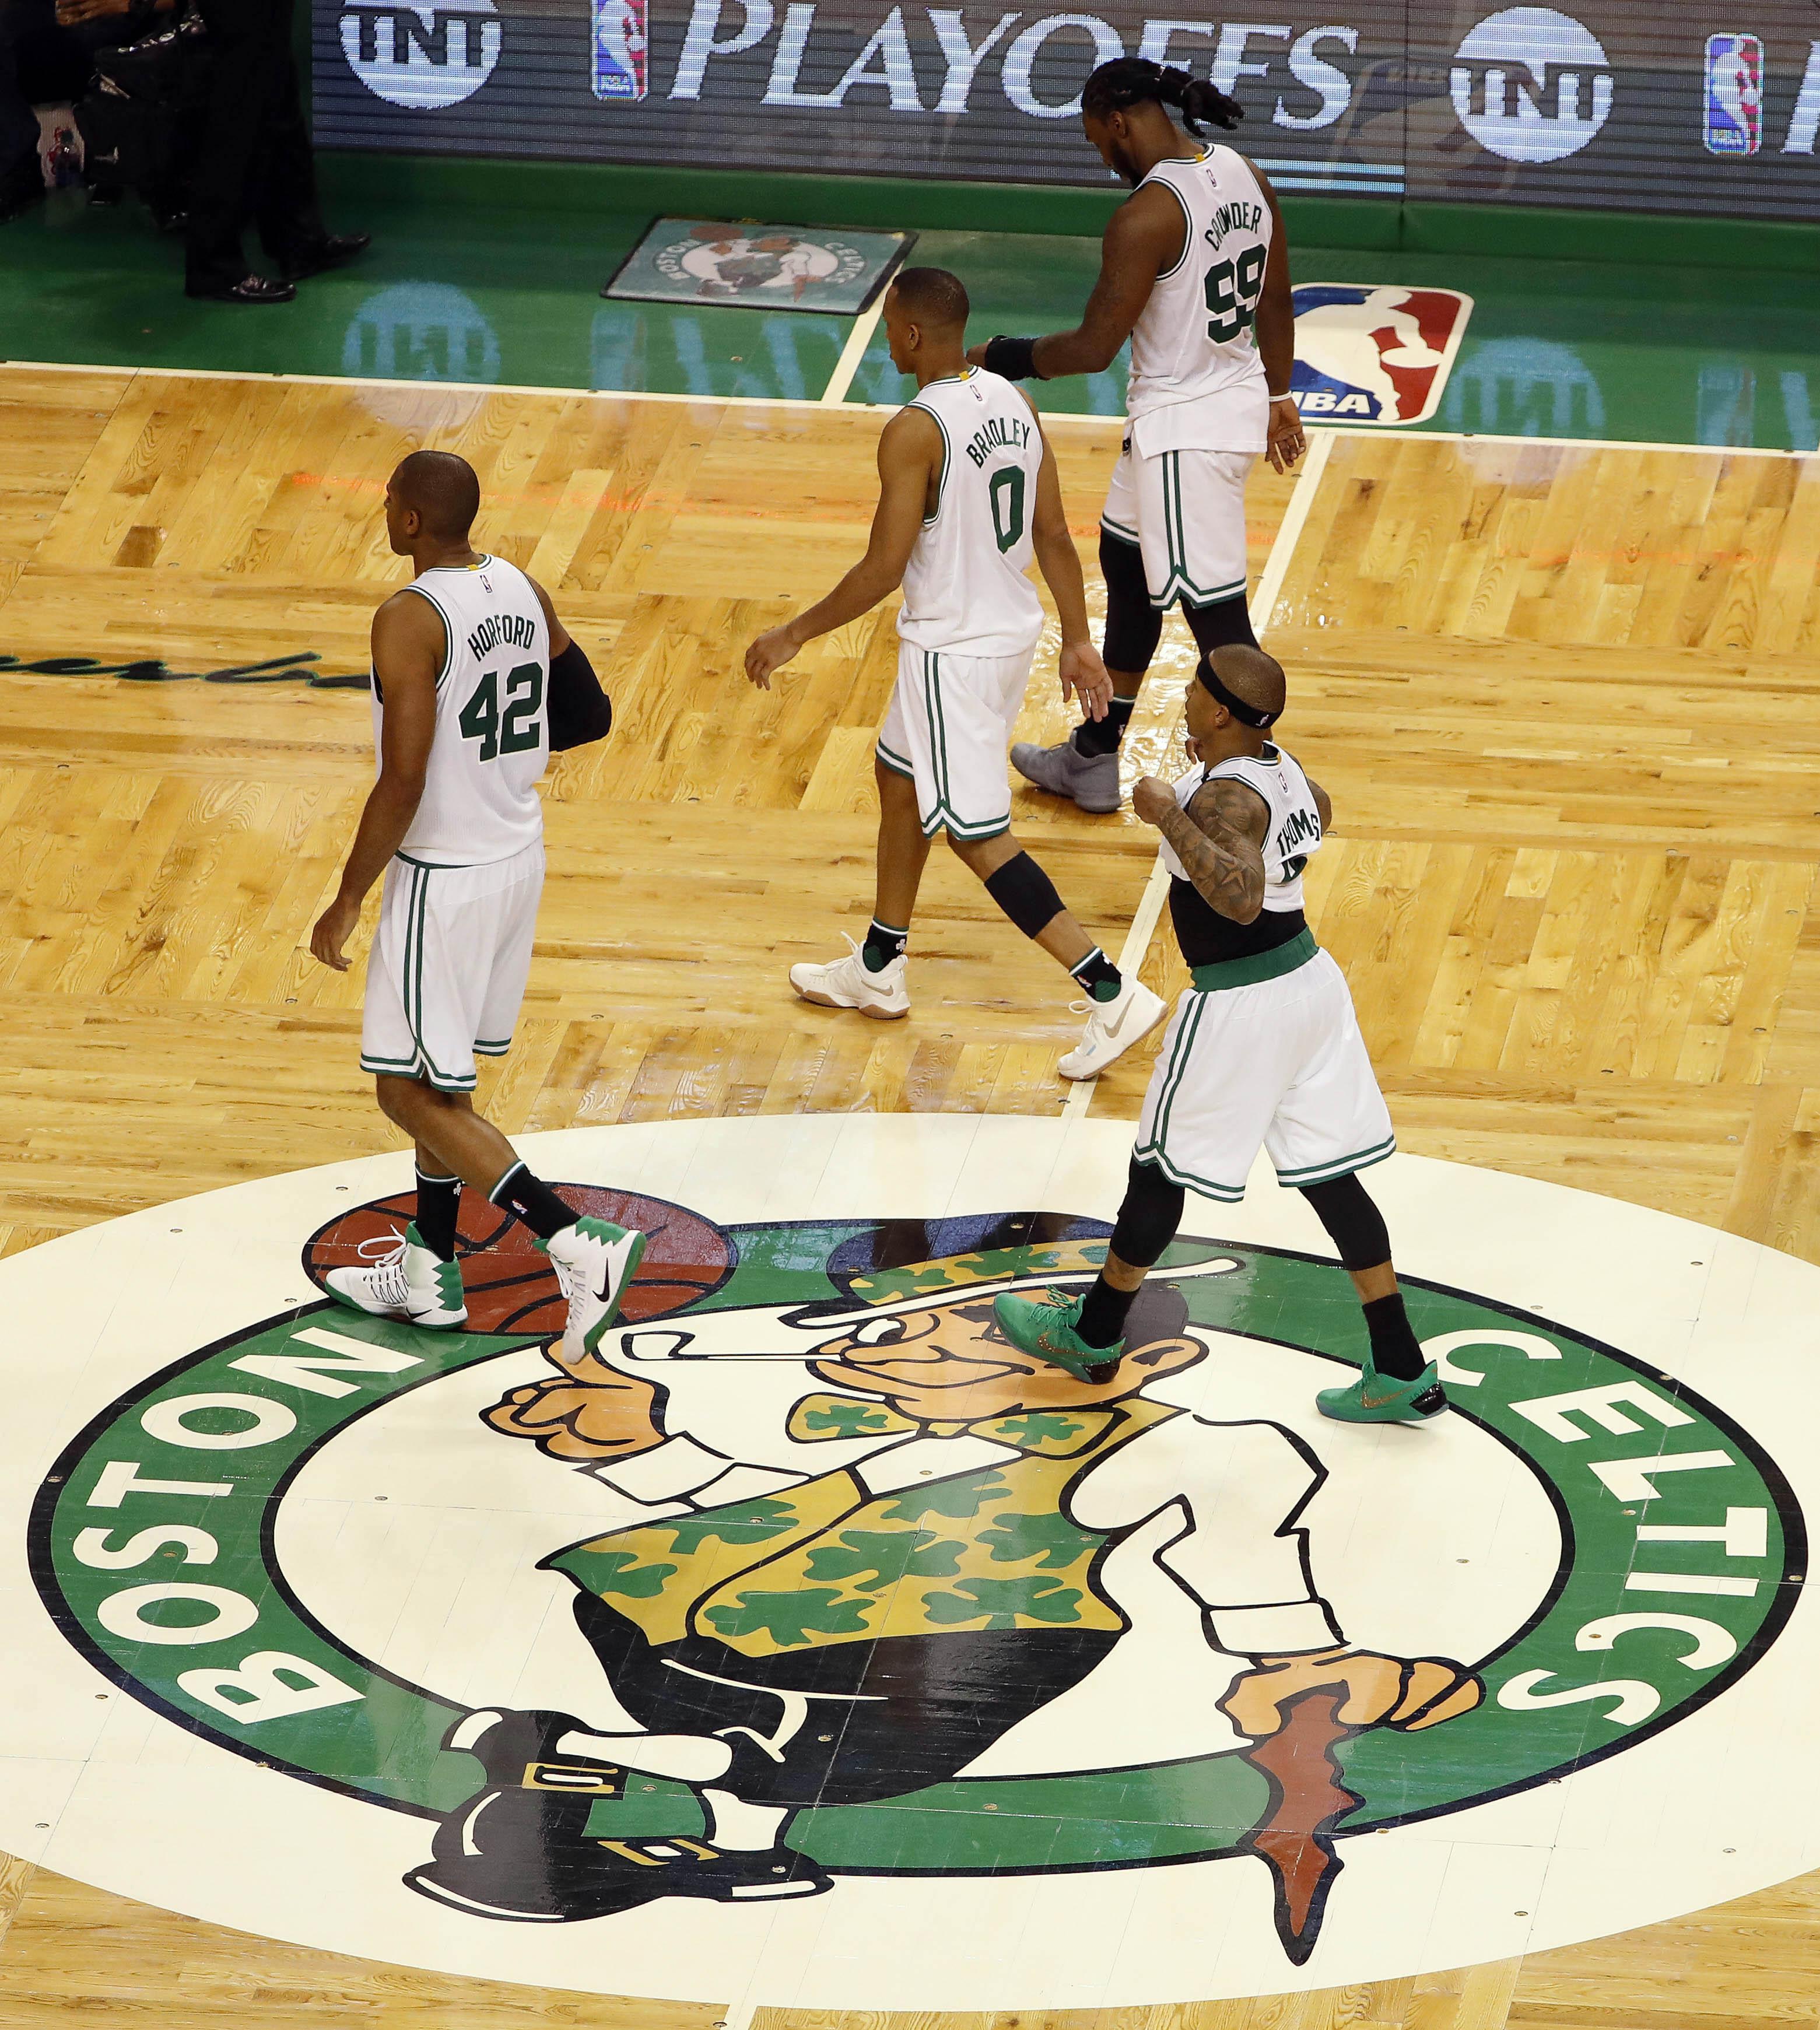 10016852-nba-playoffs-chicago-bulls-at-boston-celtics